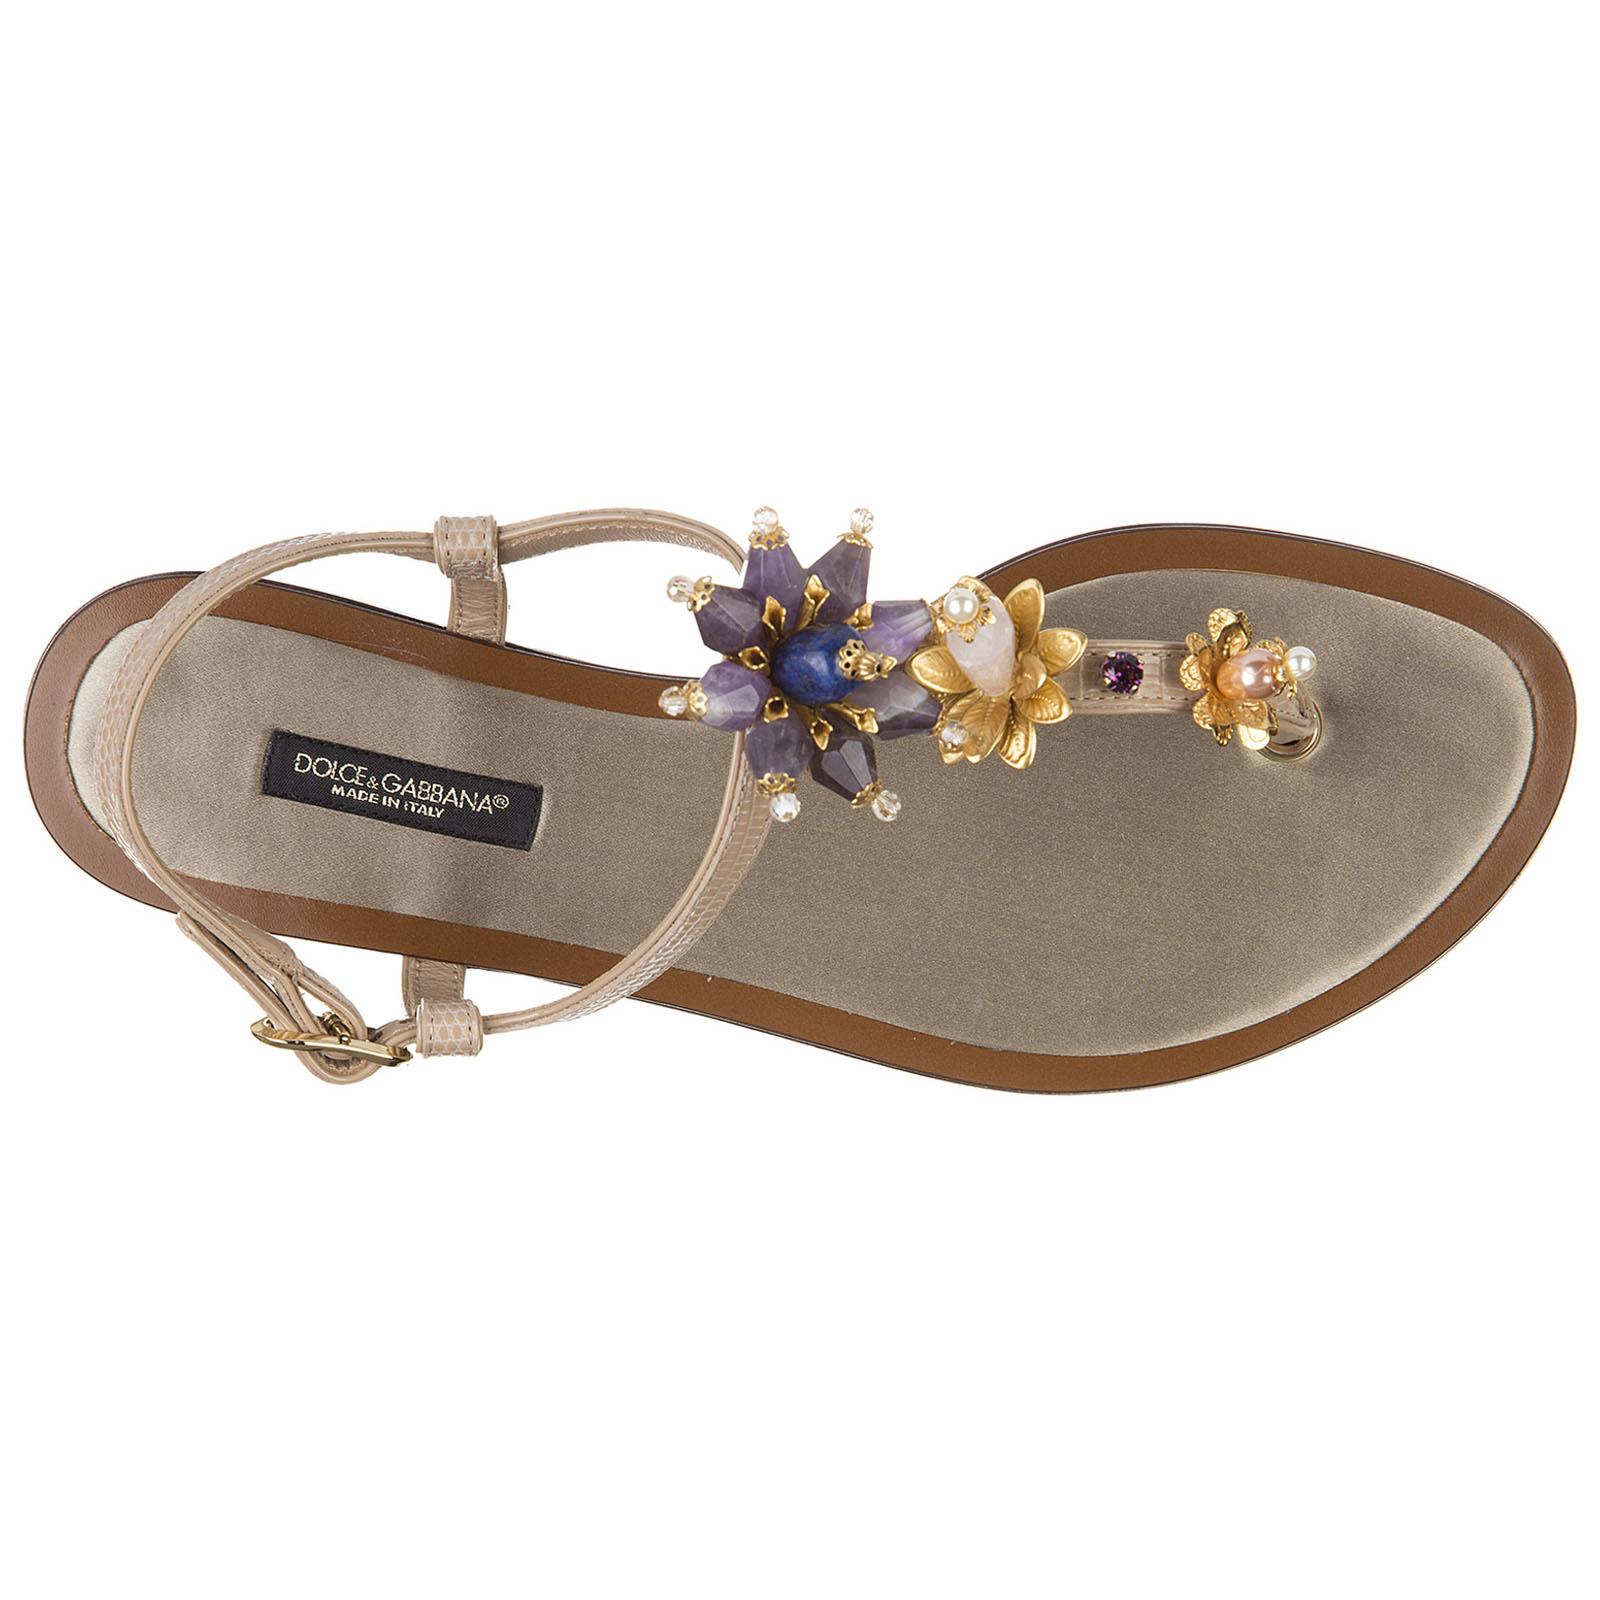 Women's leather flip flops sandals  stromboli stampa iguana vernice